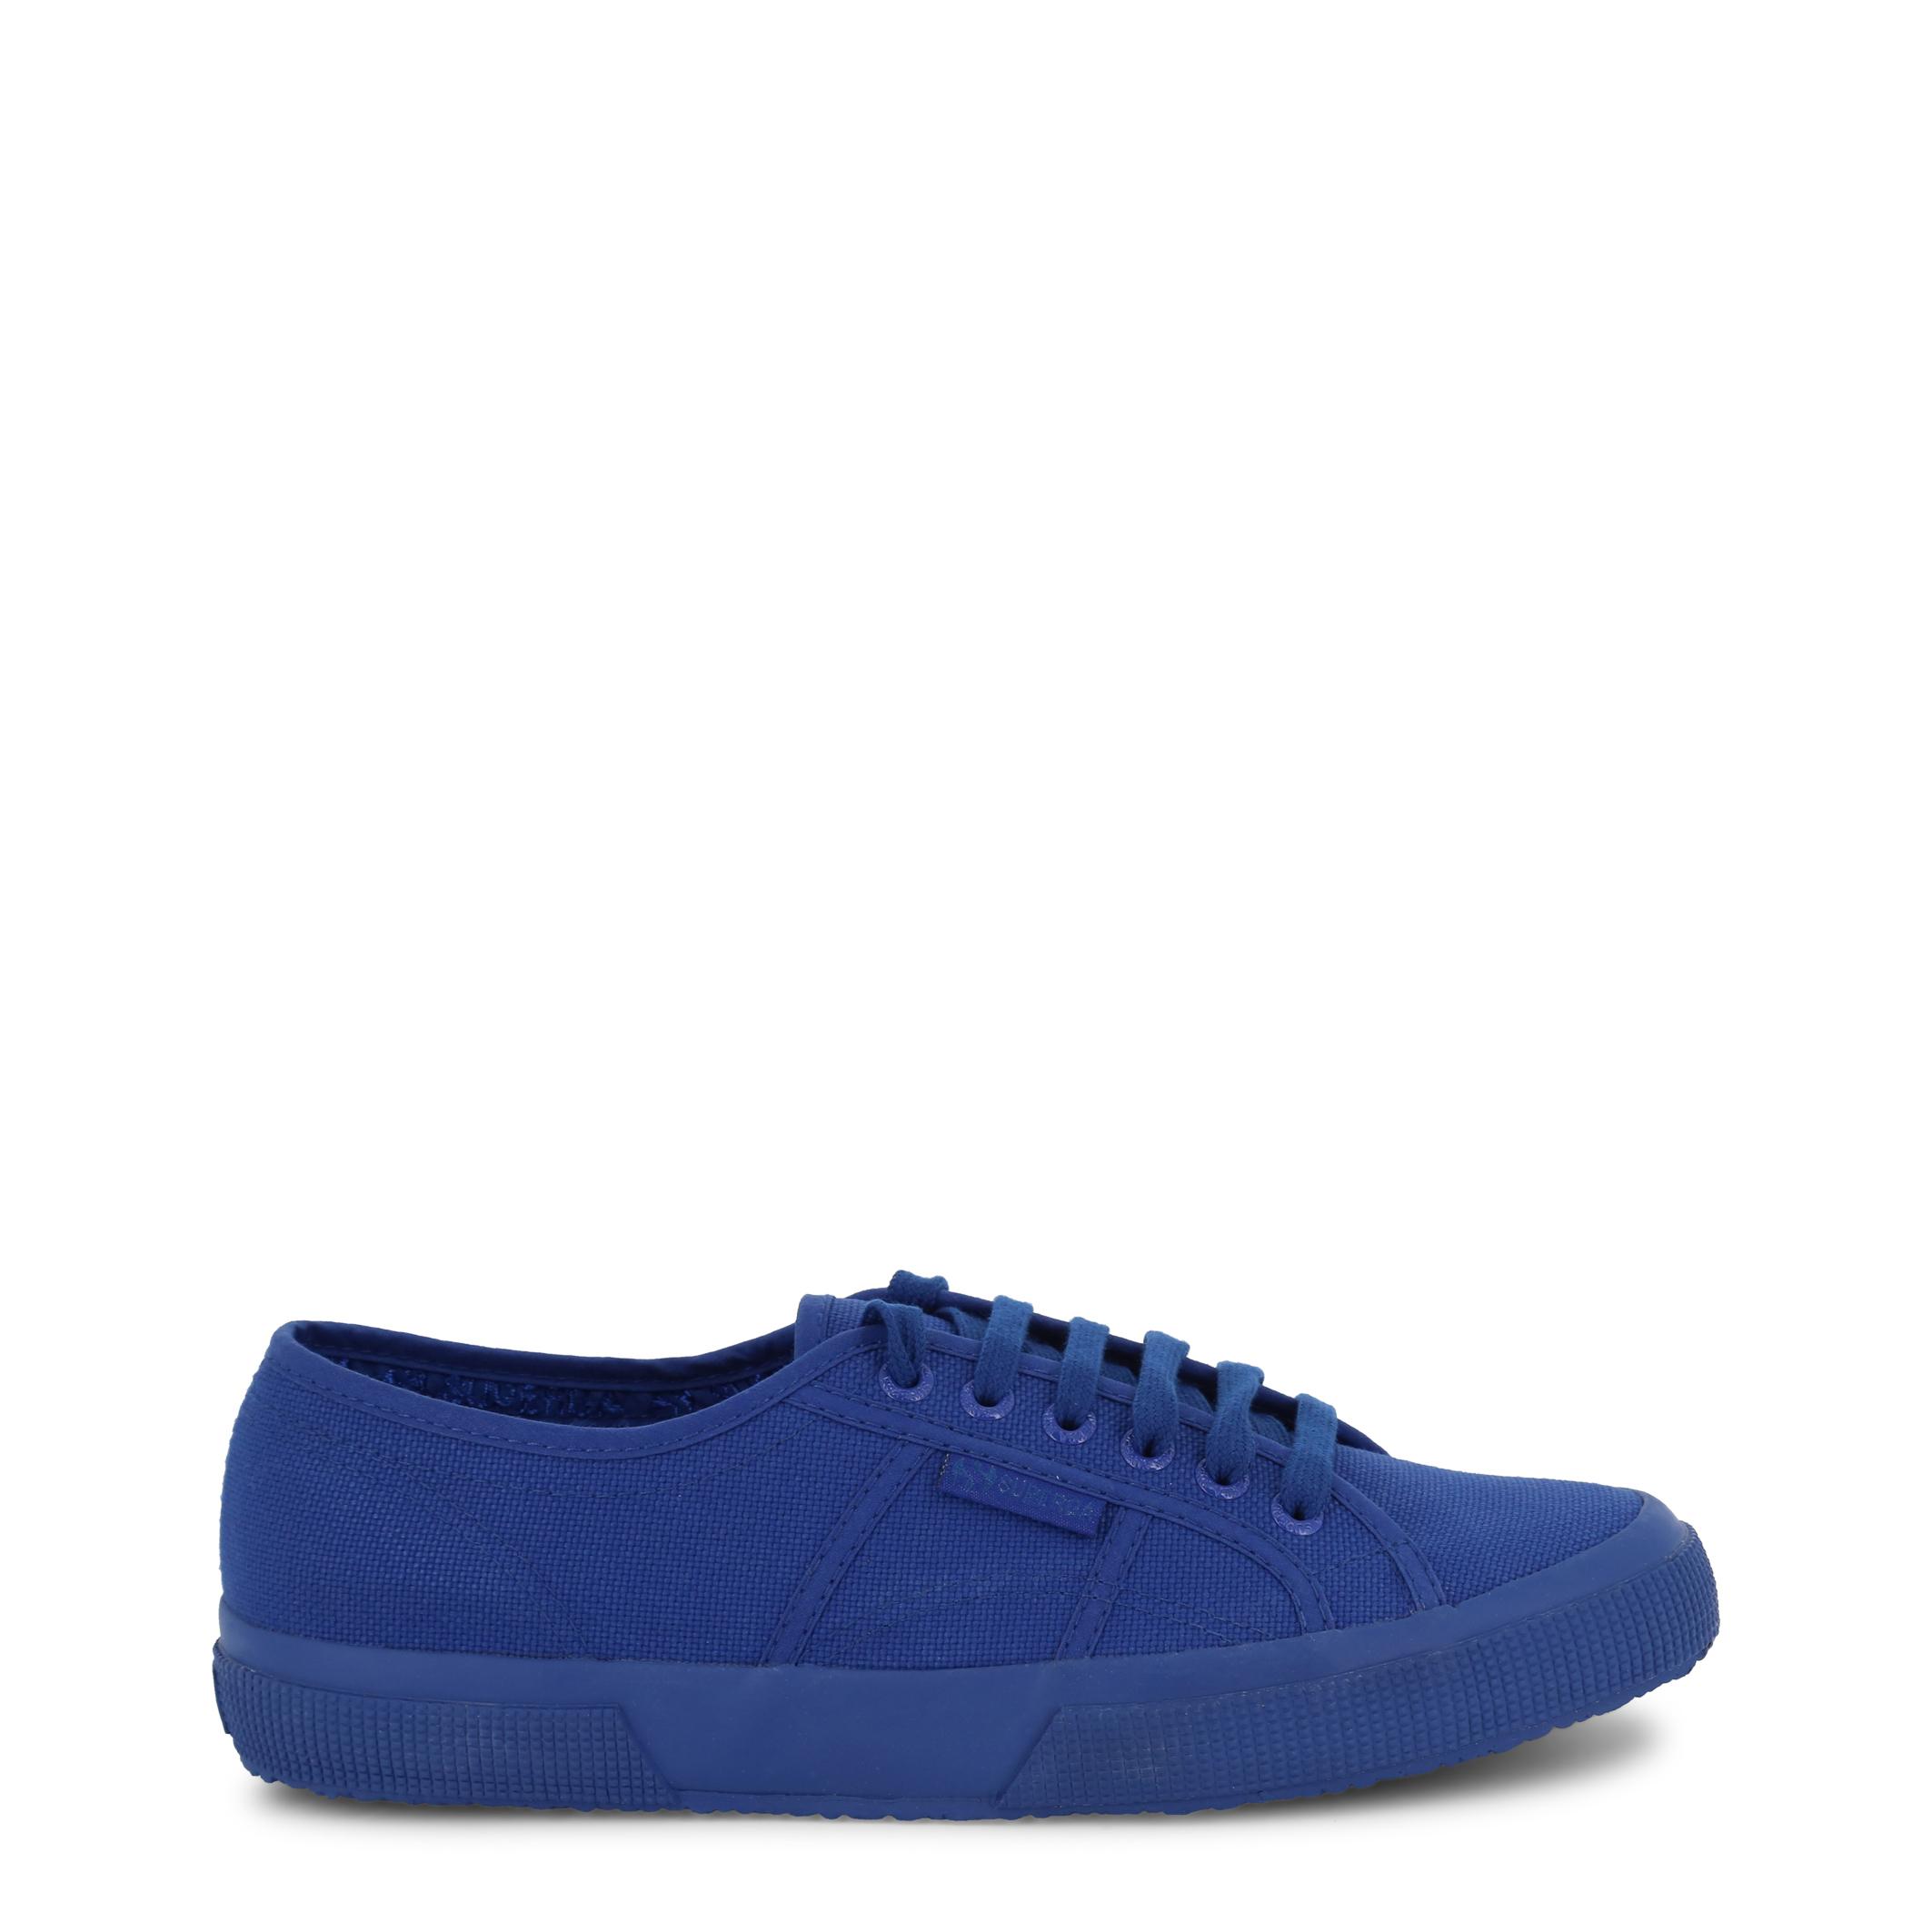 Sneakers-Superga-2750-COTU-CLASSIC-Unisex-Blu-98013